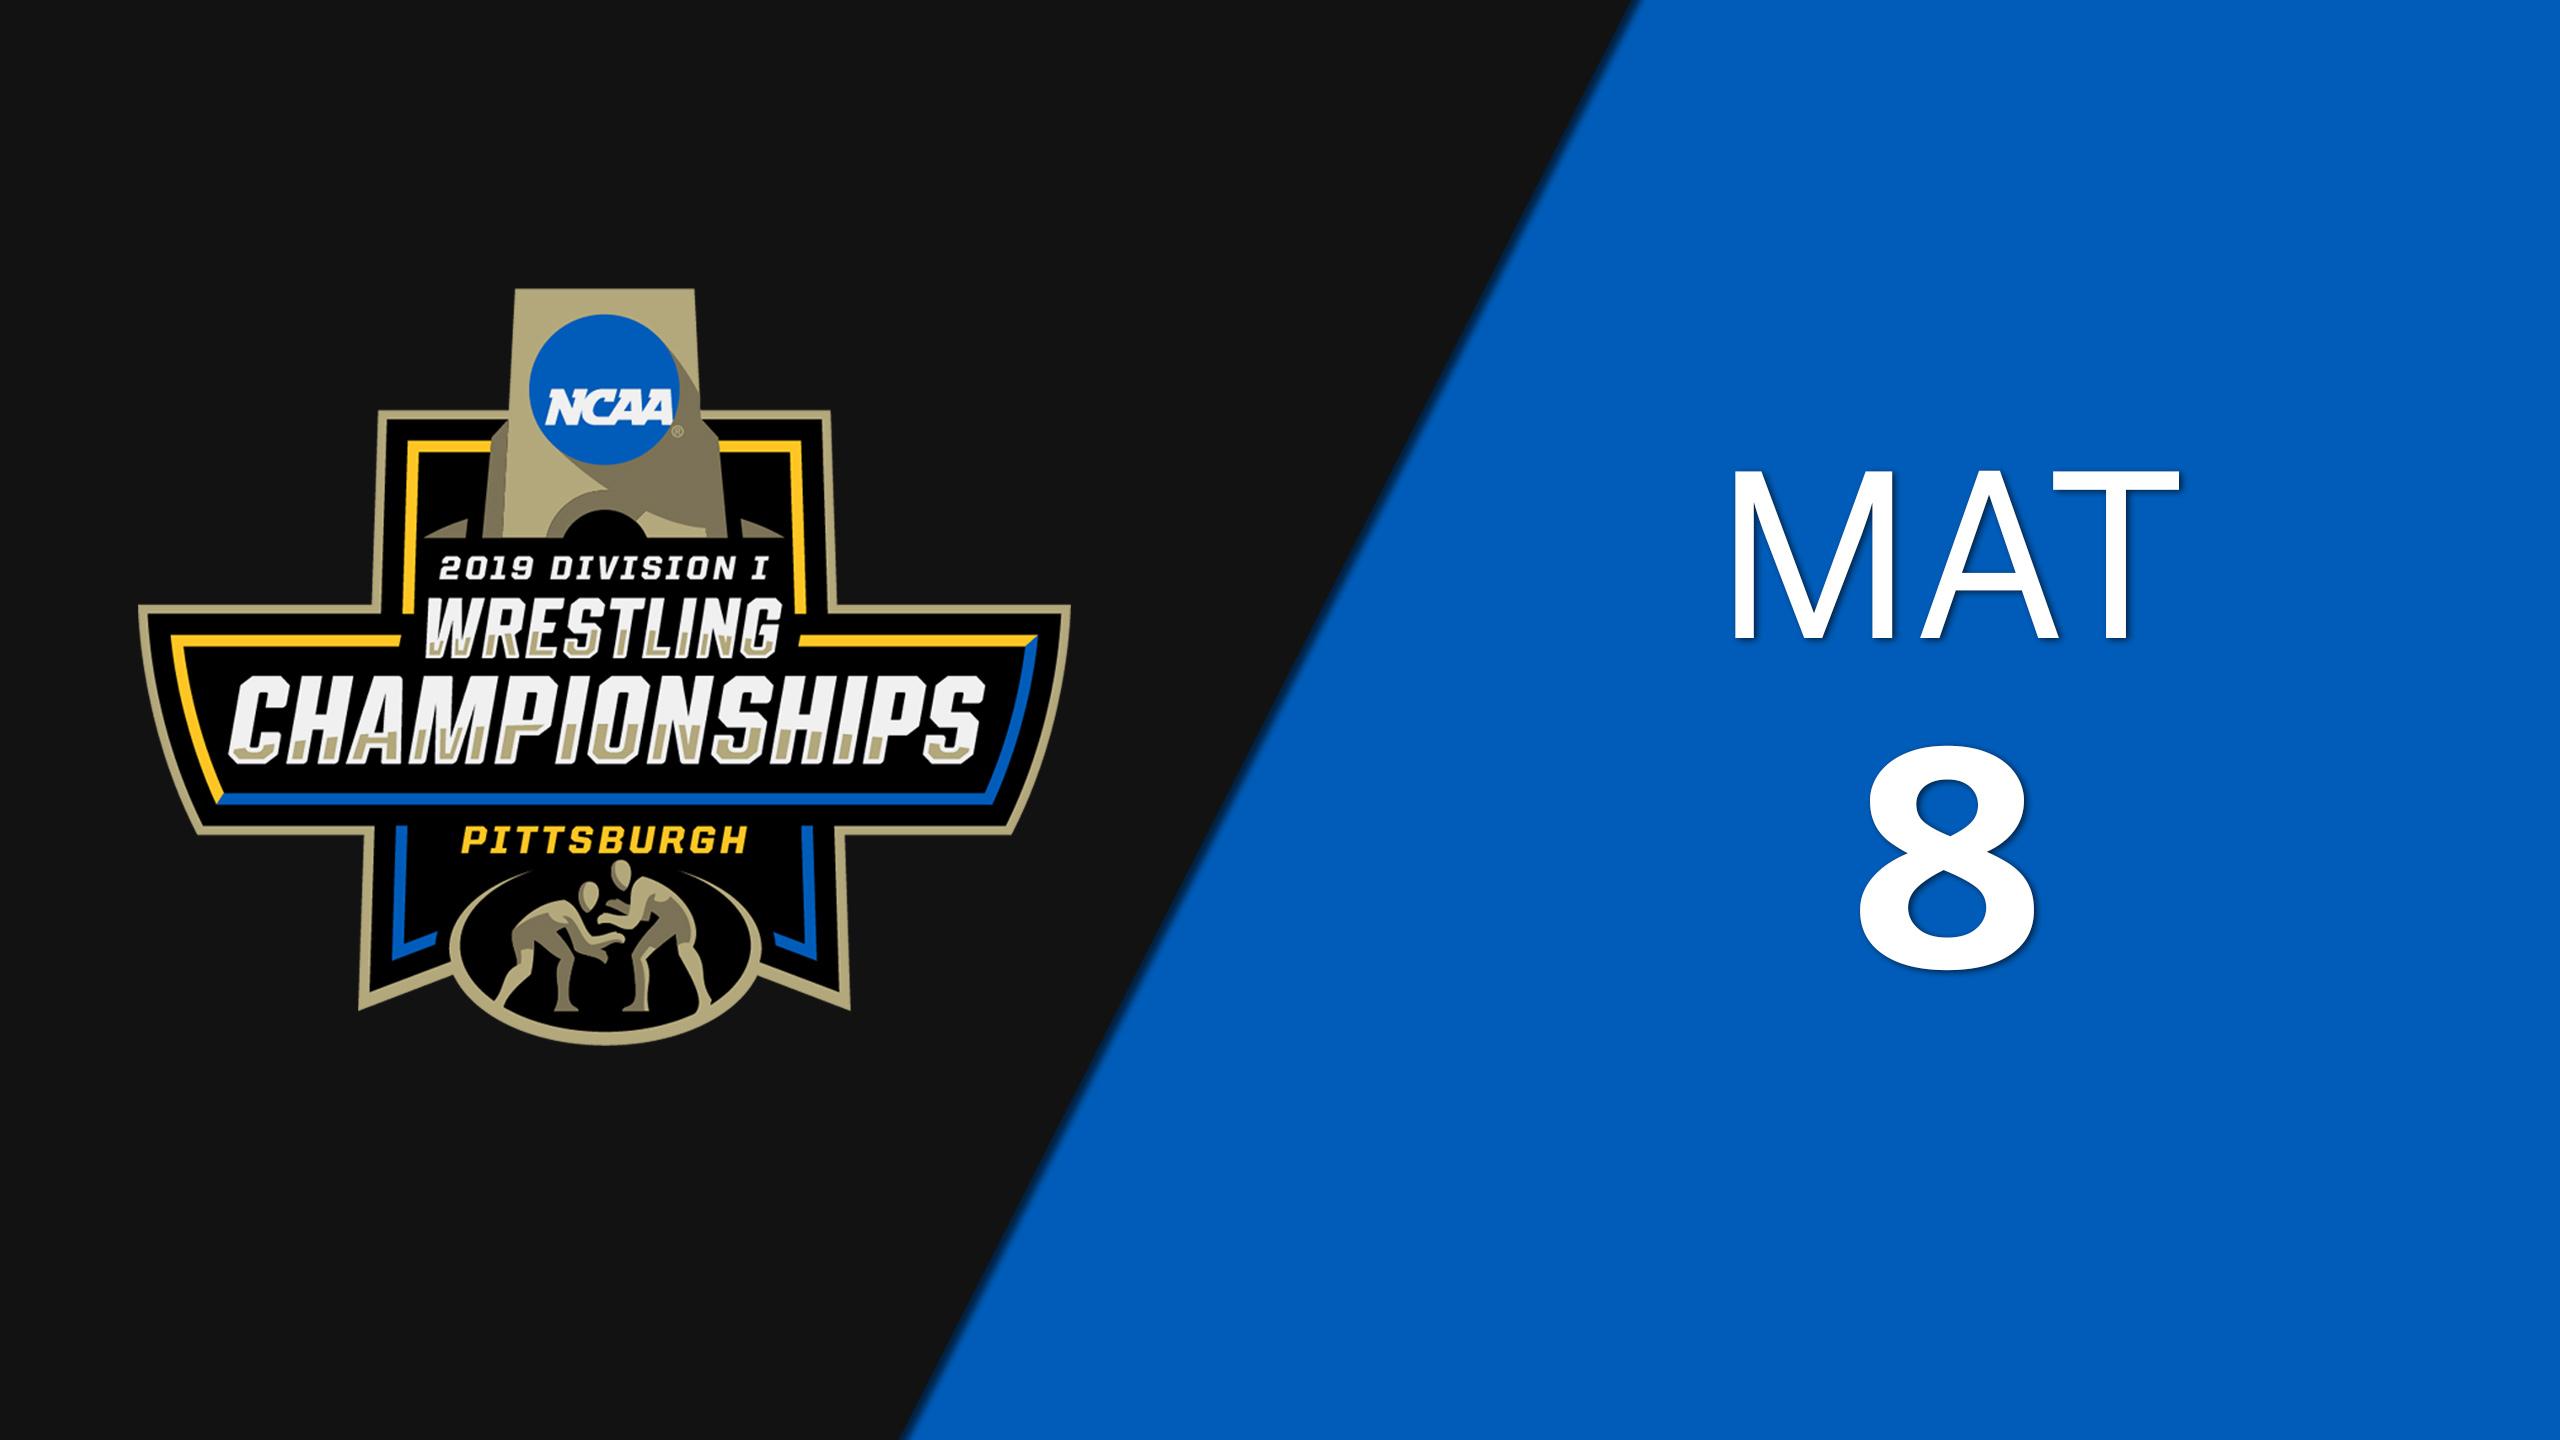 NCAA Wrestling Championship (Mat 8, First Round)